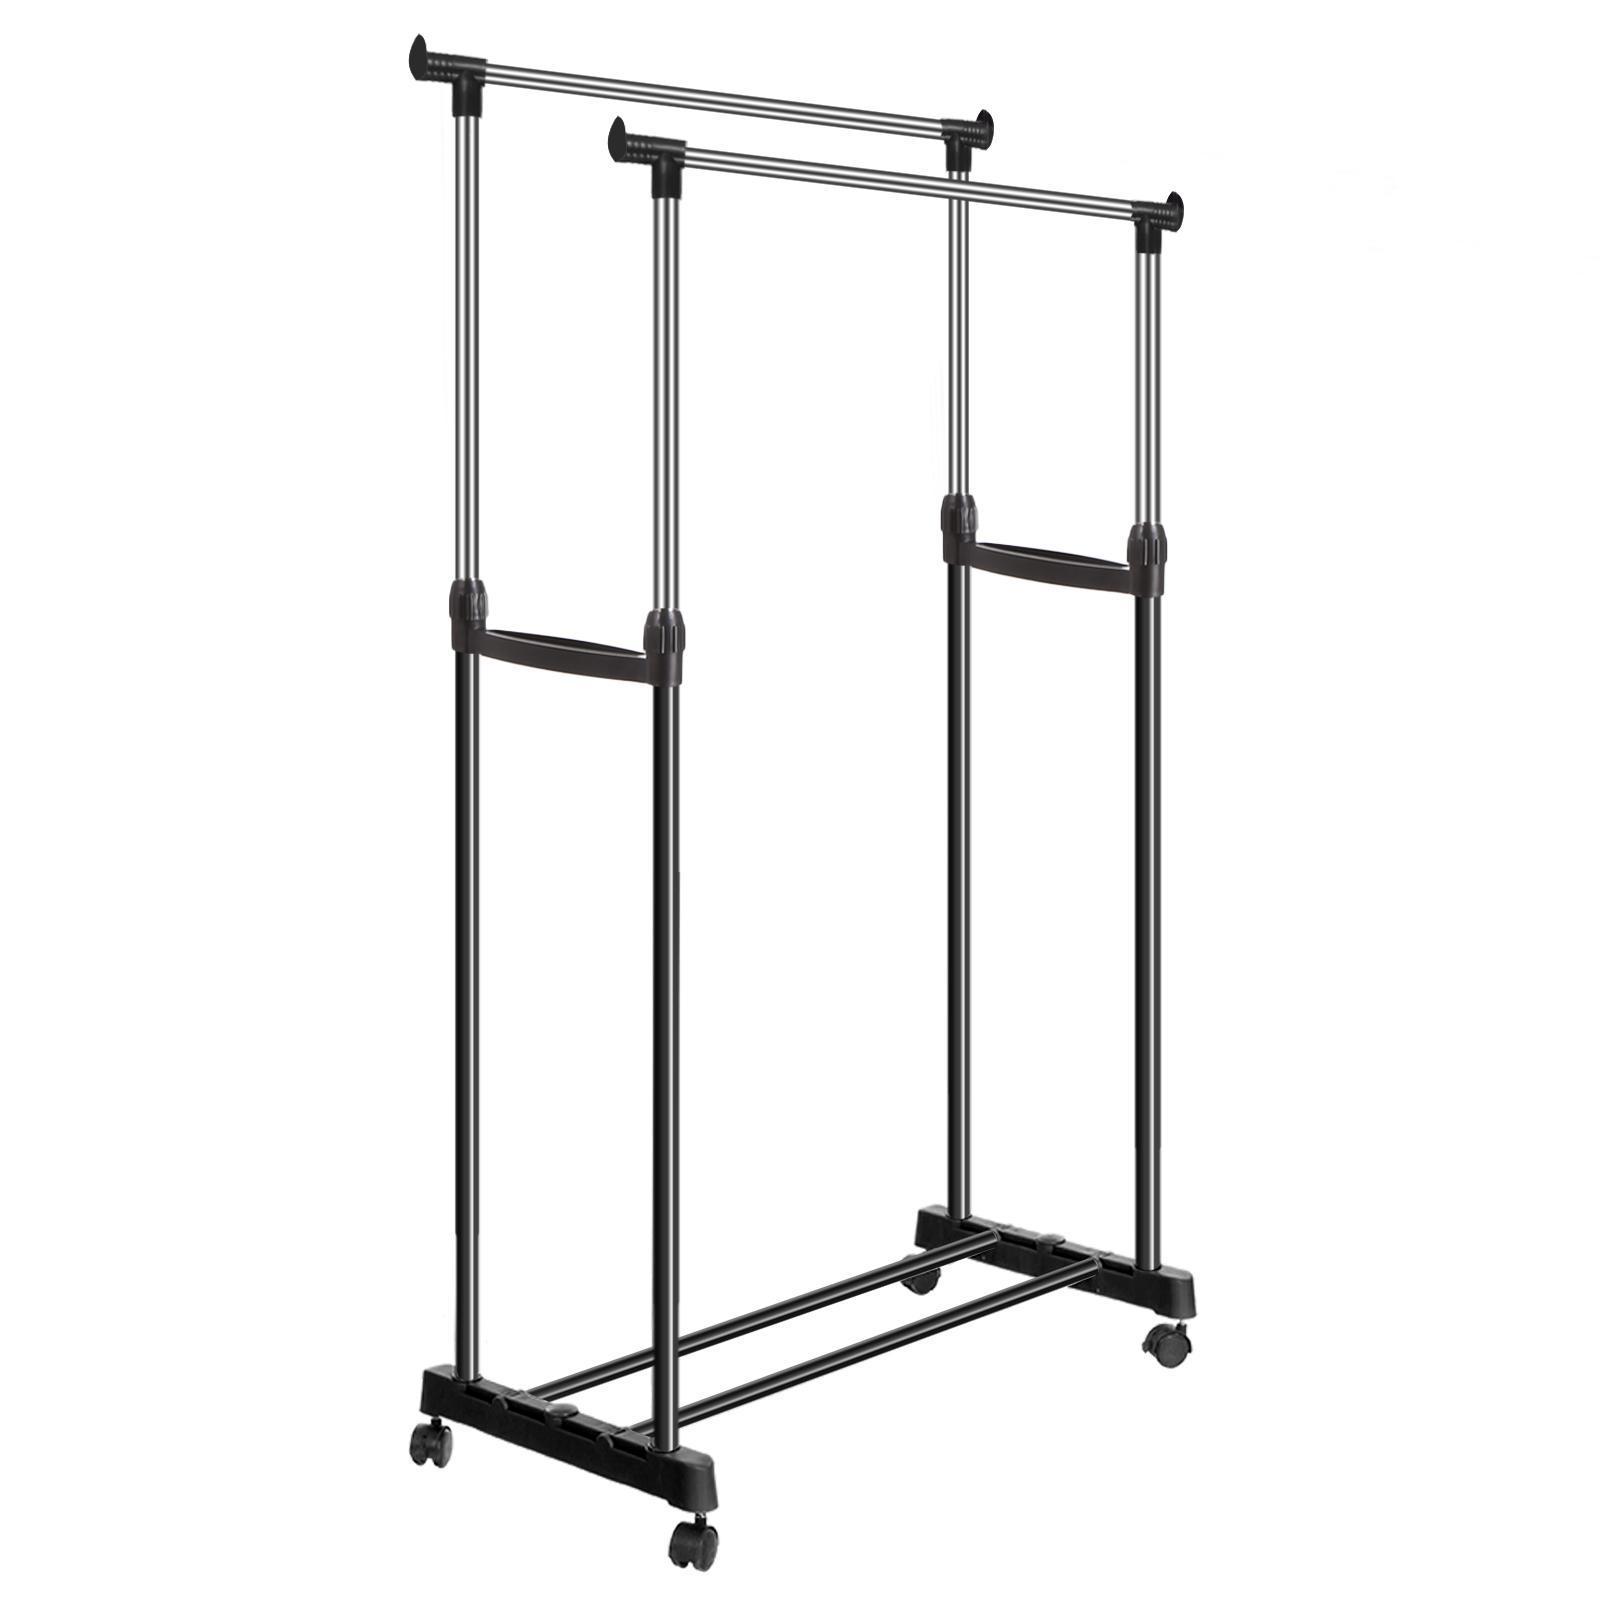 60 Portable Handrail : Portable double rolling rail adjustable clothes garment